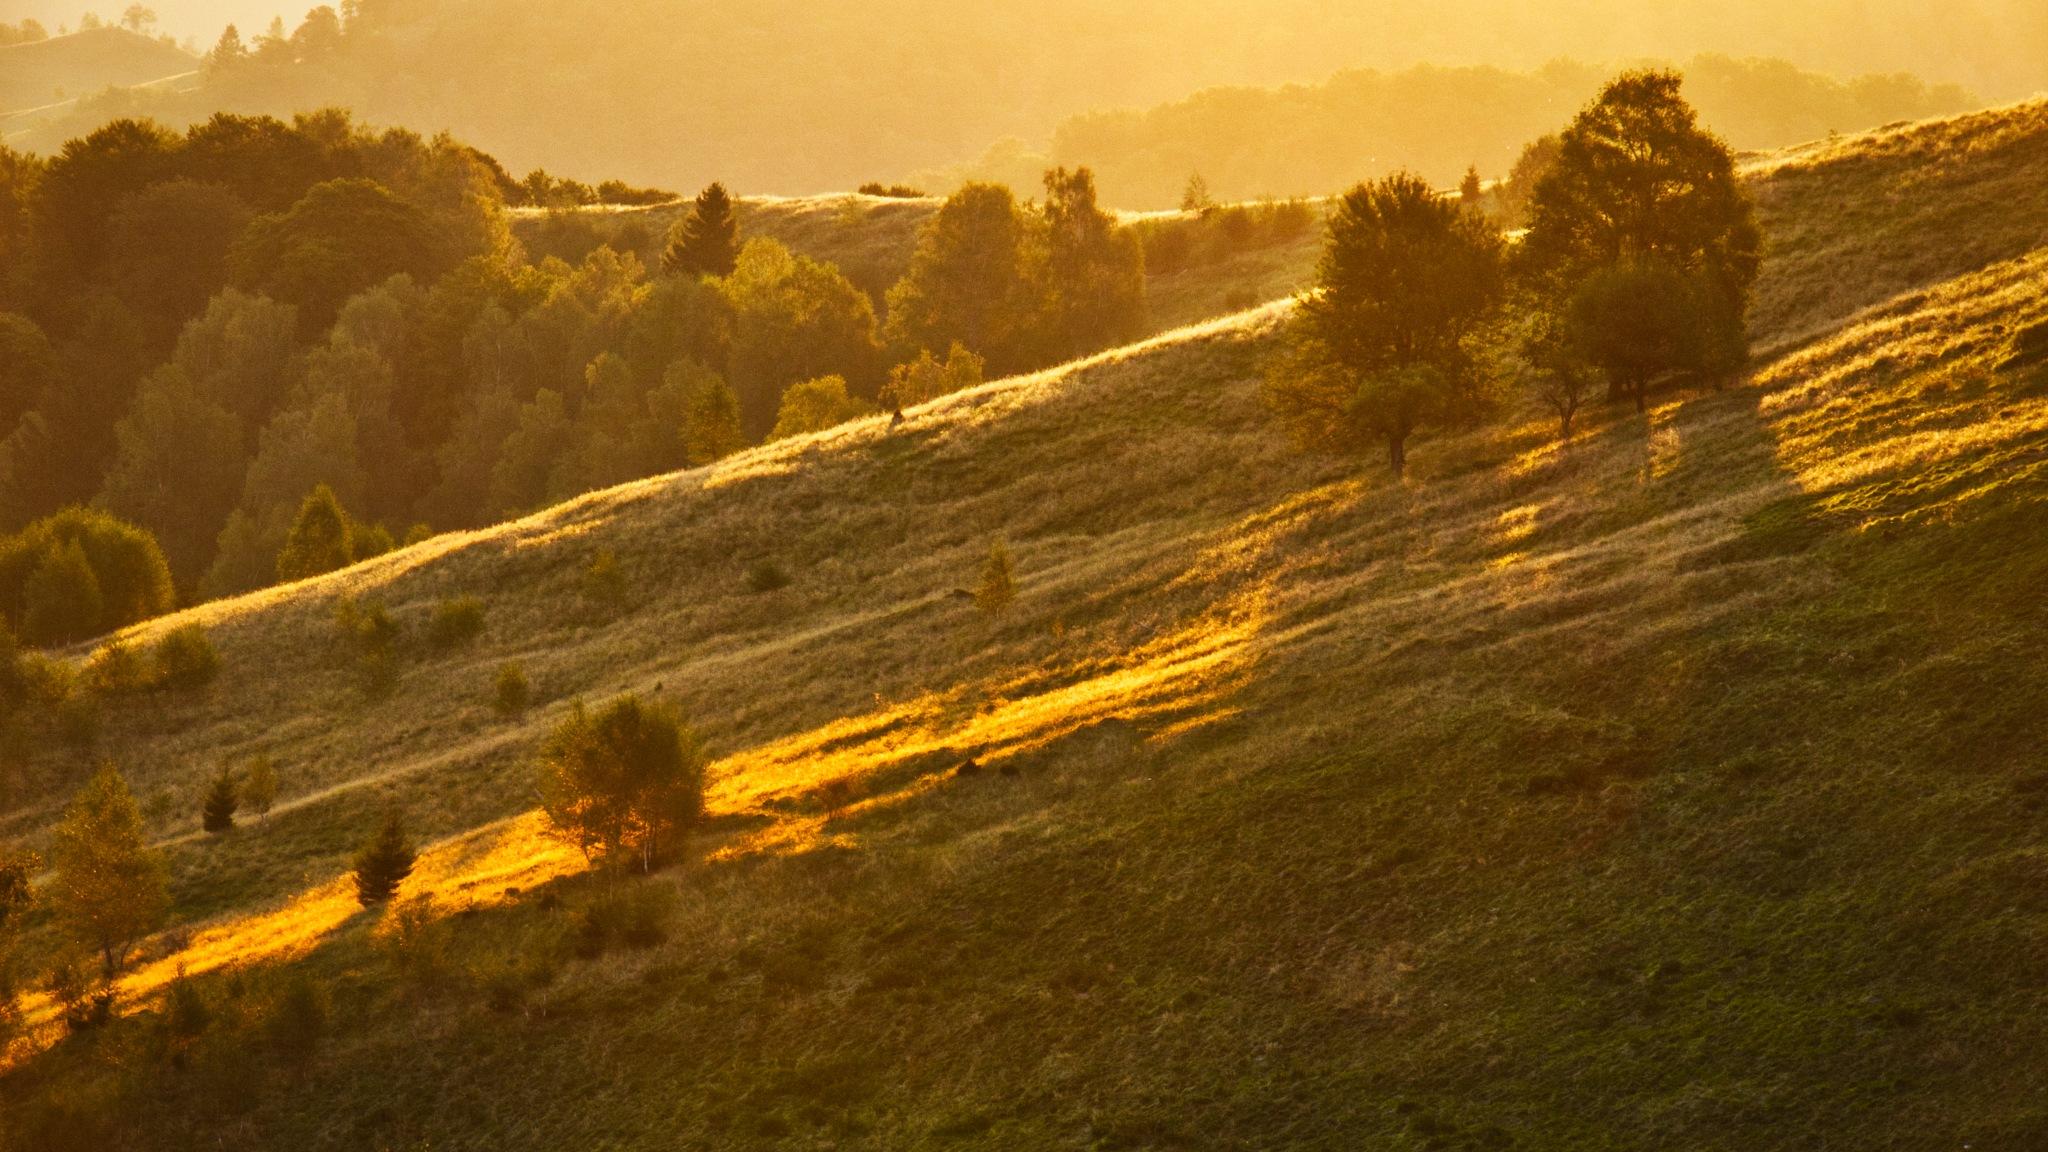 hills, lights and shadows by Adi Gli